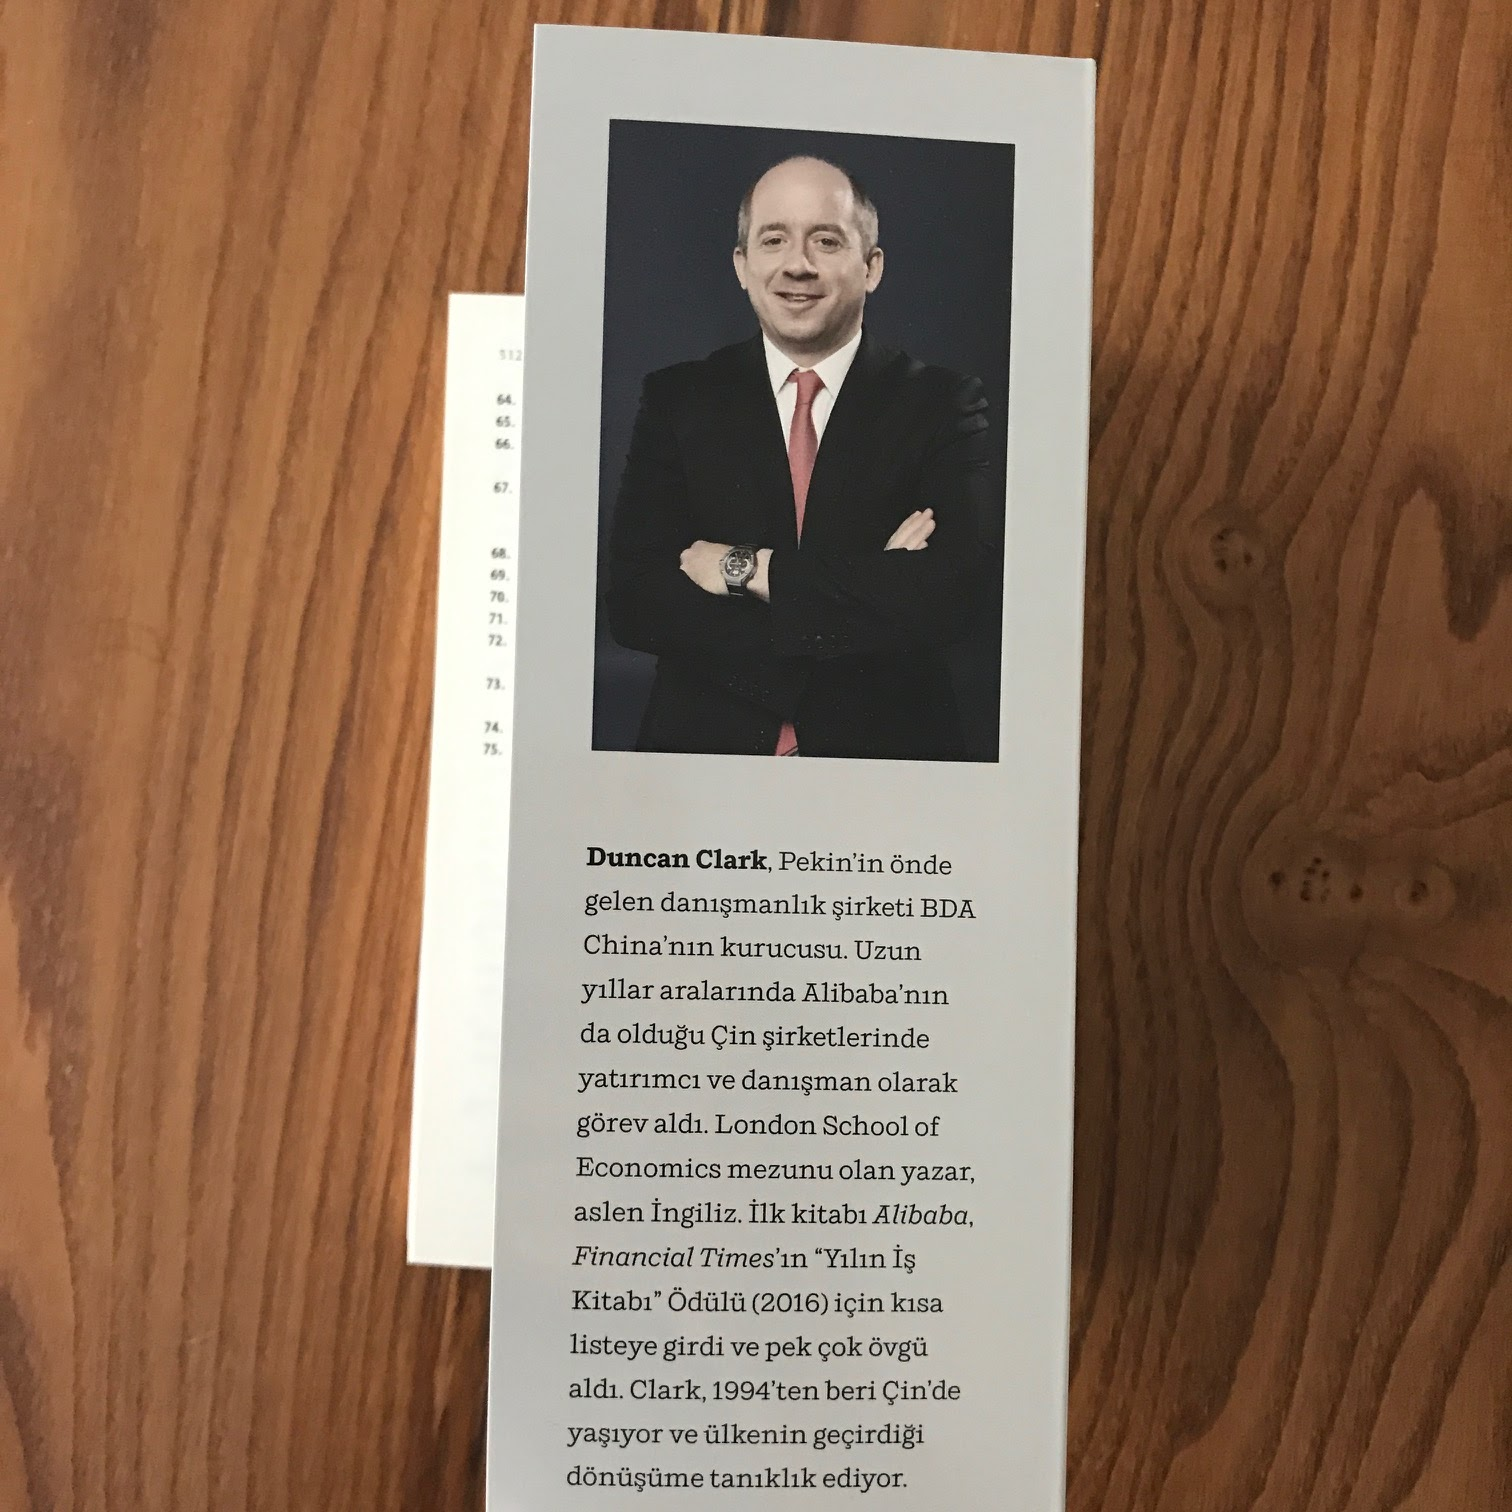 Alibaba Jack Ma'nin Evi - AliExpress'in Kurucusunun Akil Almaz Oykusu (Kitap) Ic Kapak